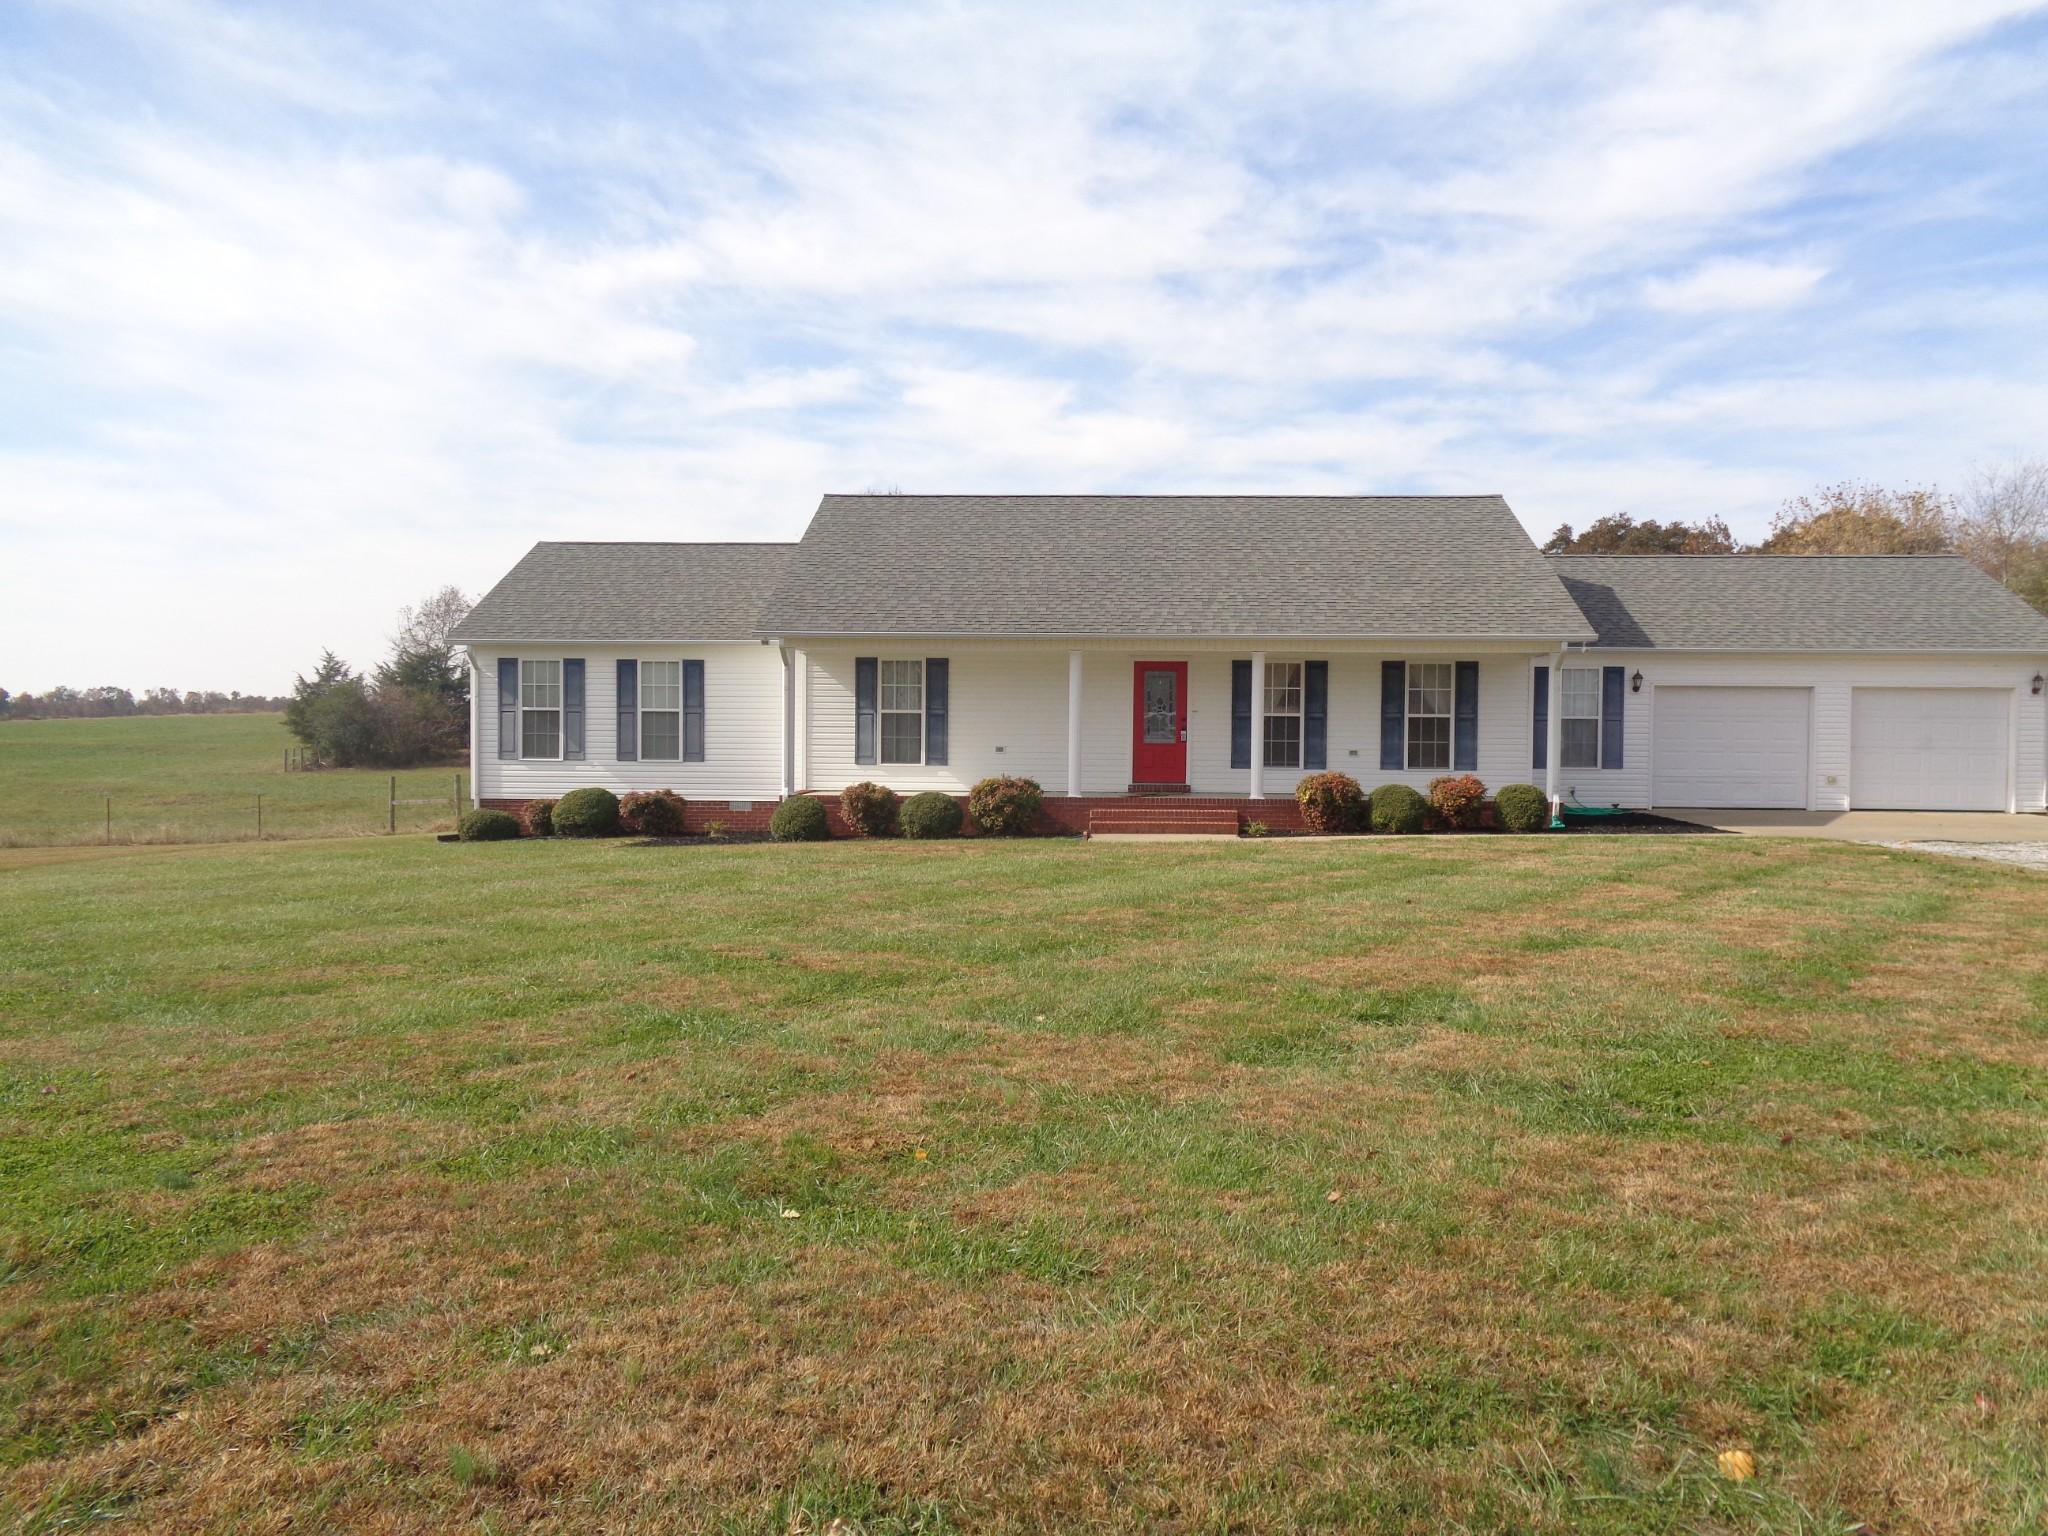 159 Blue Heron Dr, Leoma, TN 38468 - Leoma, TN real estate listing